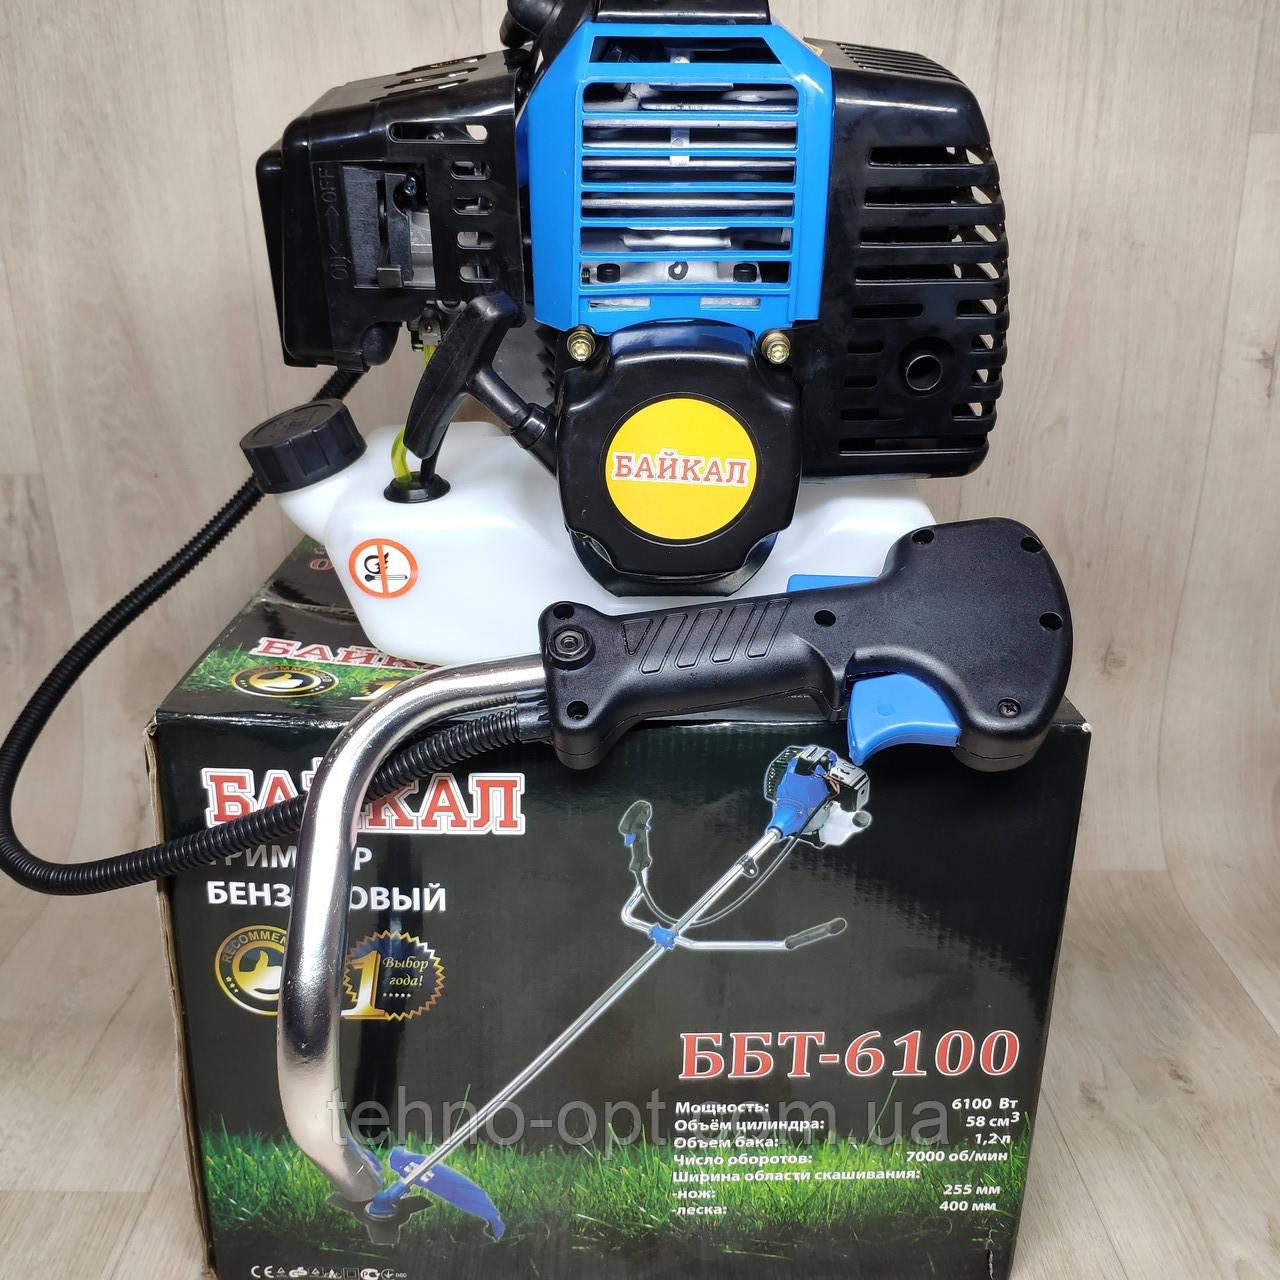 Бензокоса Байкал ББТ-6100 Professional 2 ножа 1 катушка